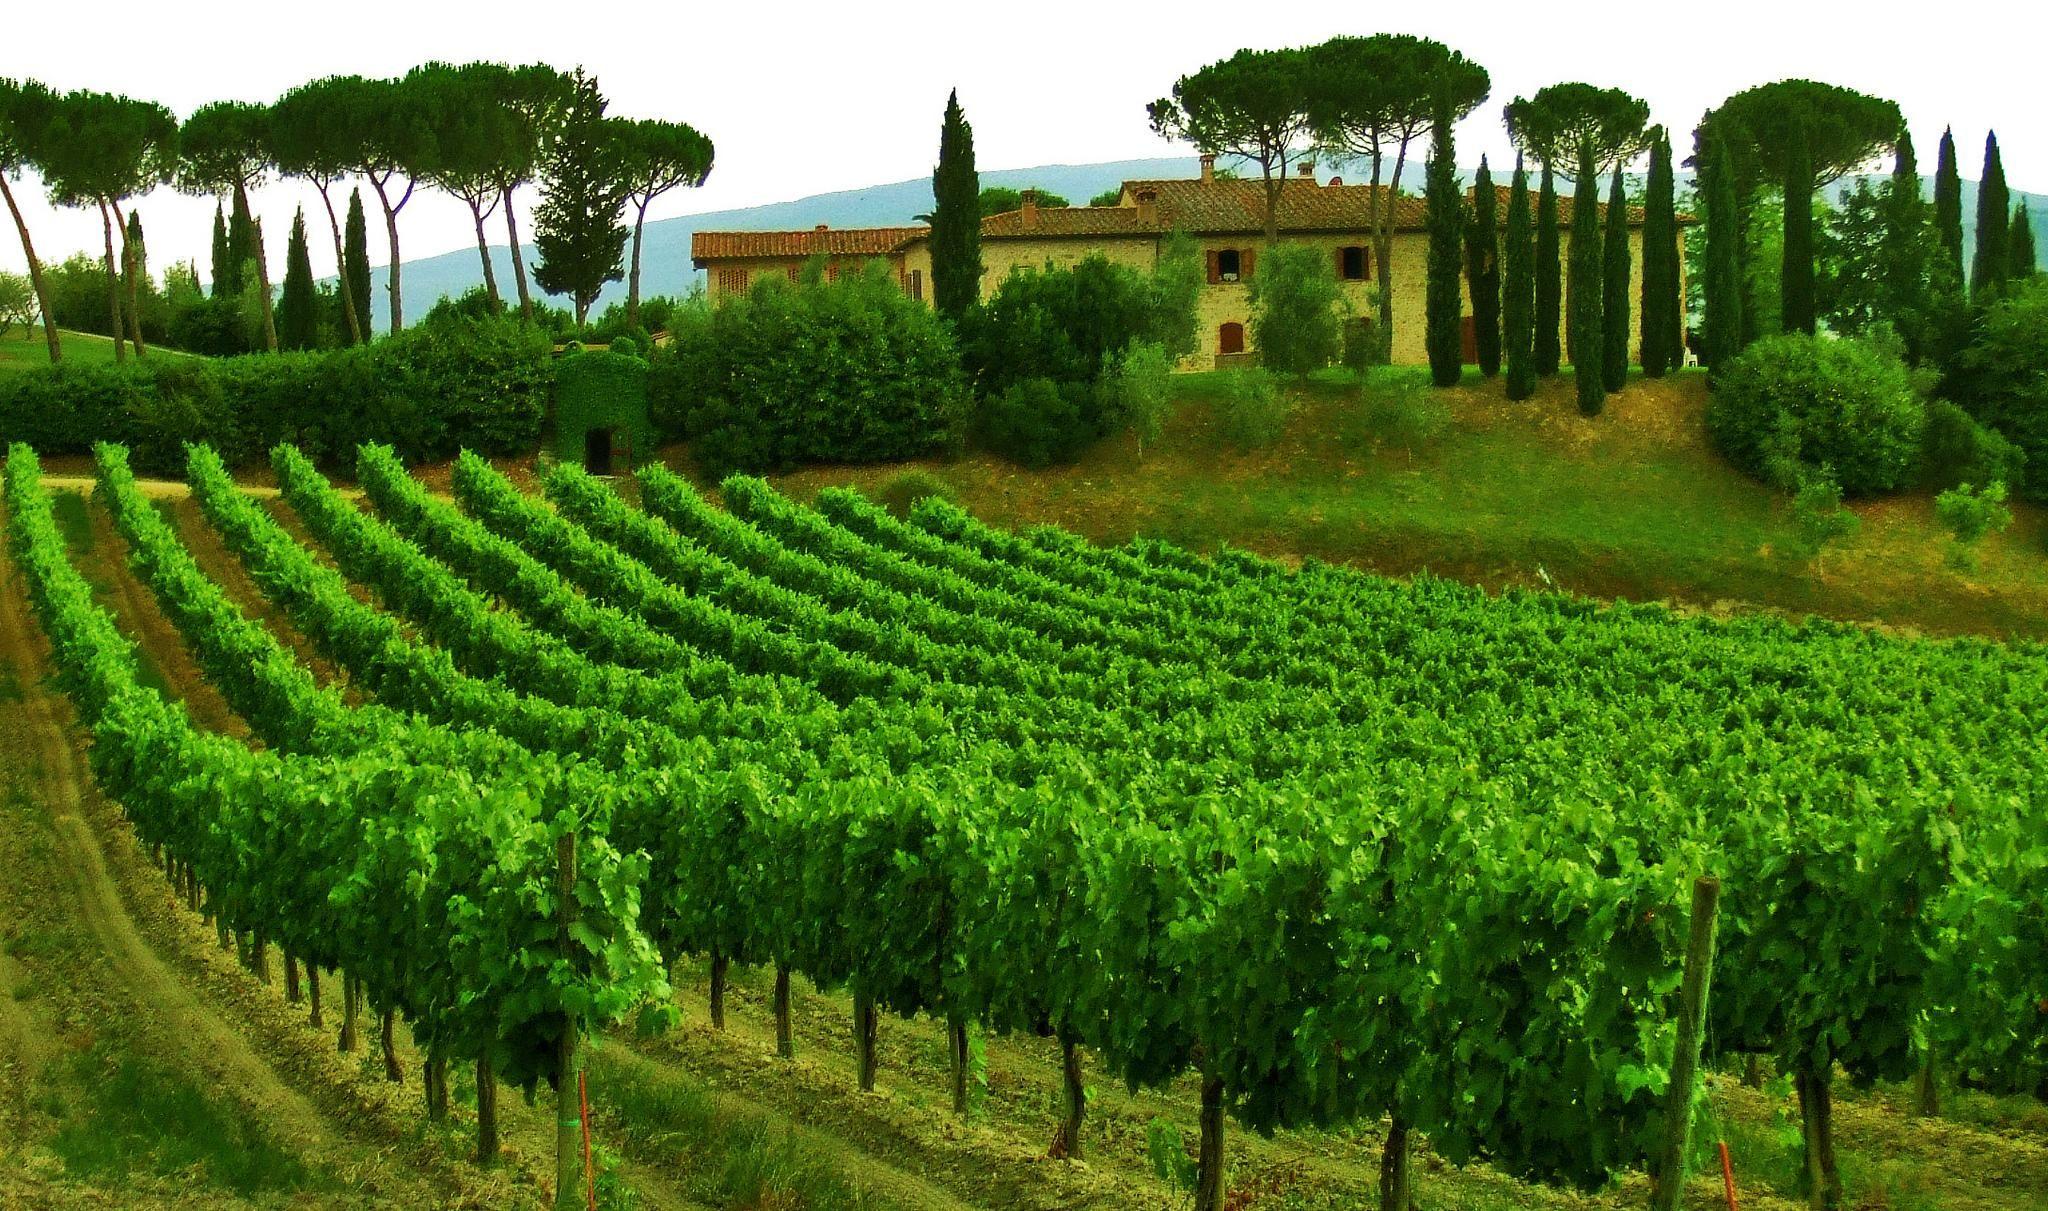 фотожурналистом можно плантации в италии фото интересно